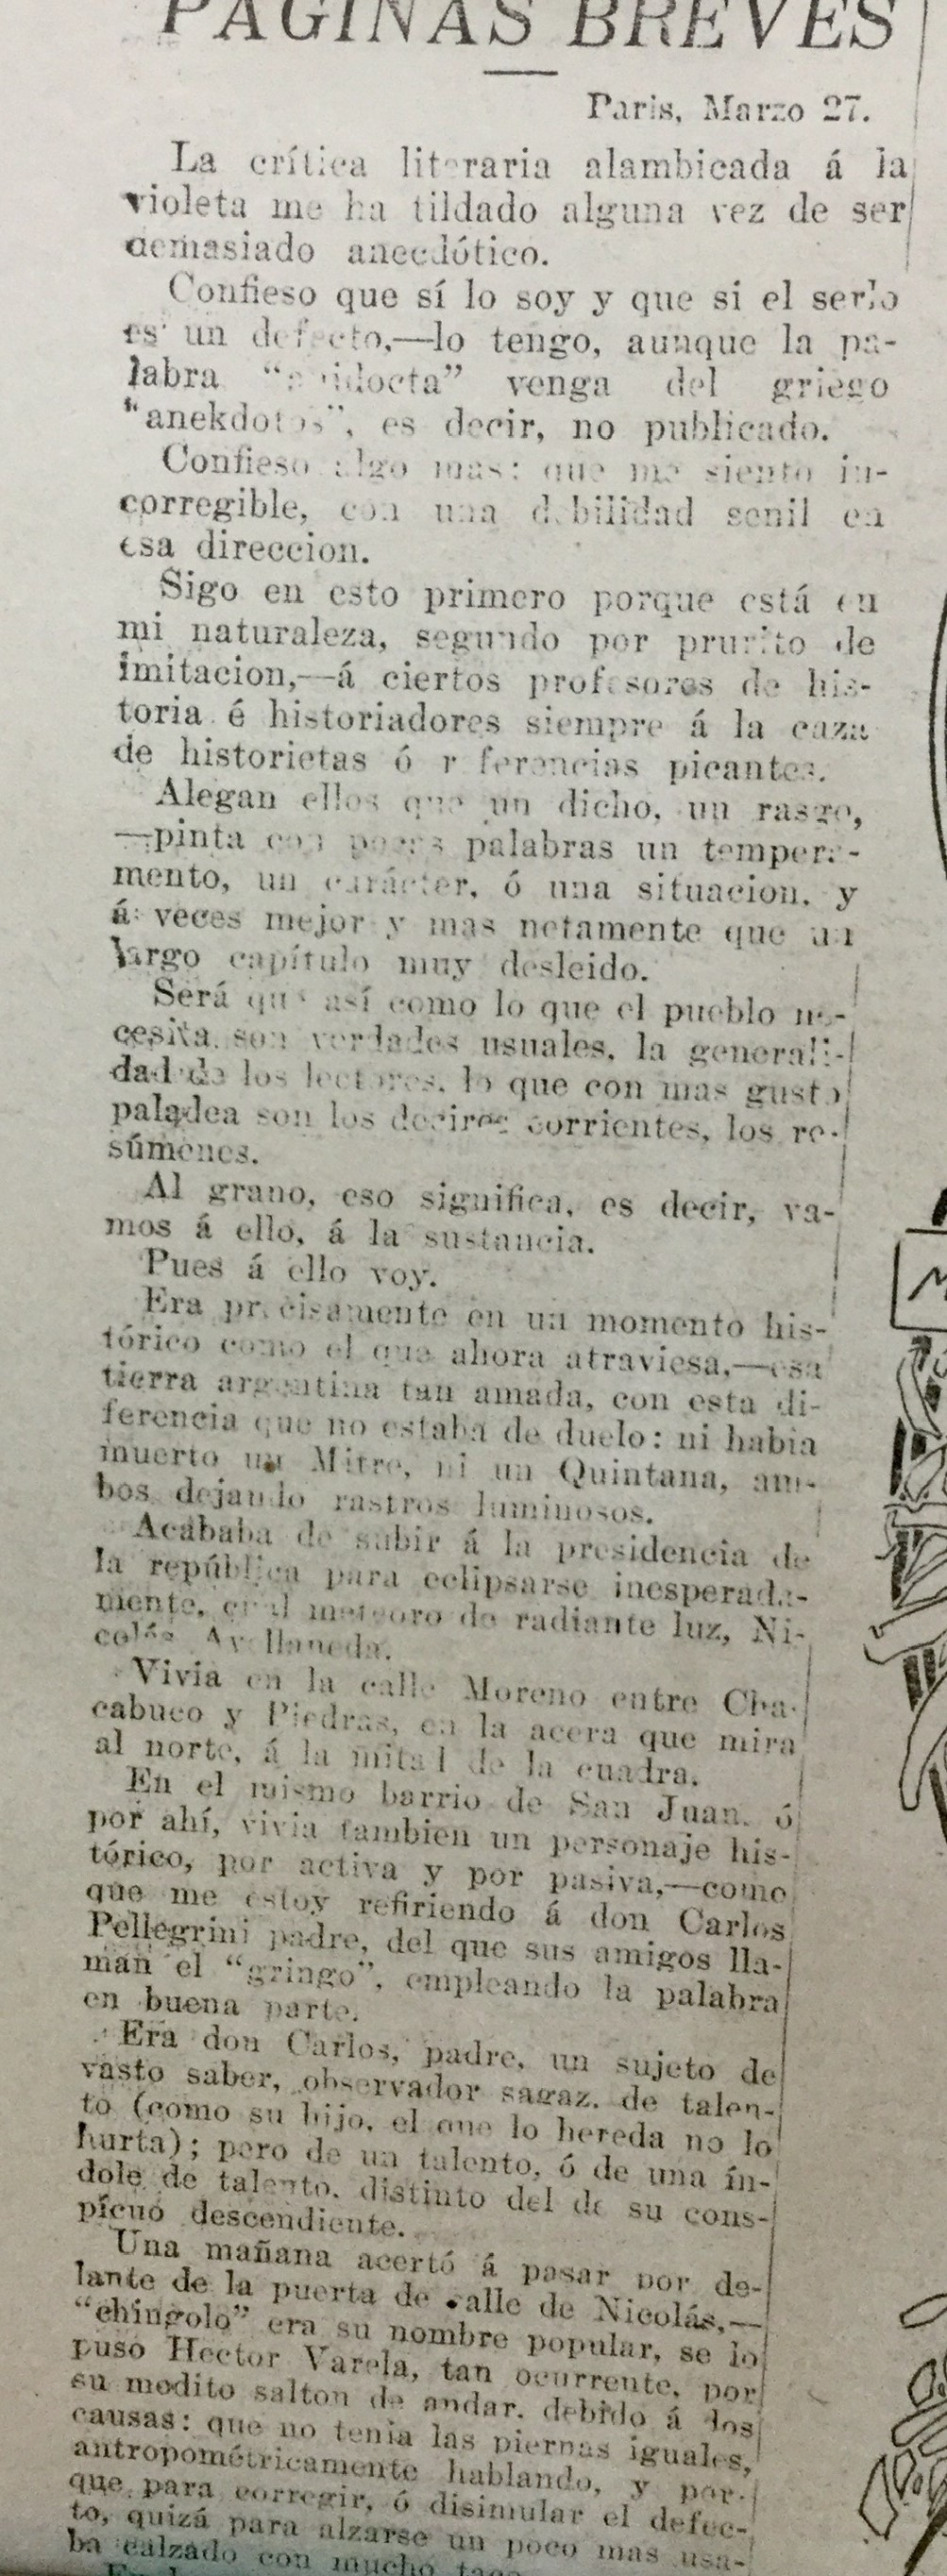 C:UsersnataliaDesktopLucioPAGINAS BREVES.FotosPaginas breves.1906PB.1906.03.MARZOPB.05.03.06IMG-4039.jpg